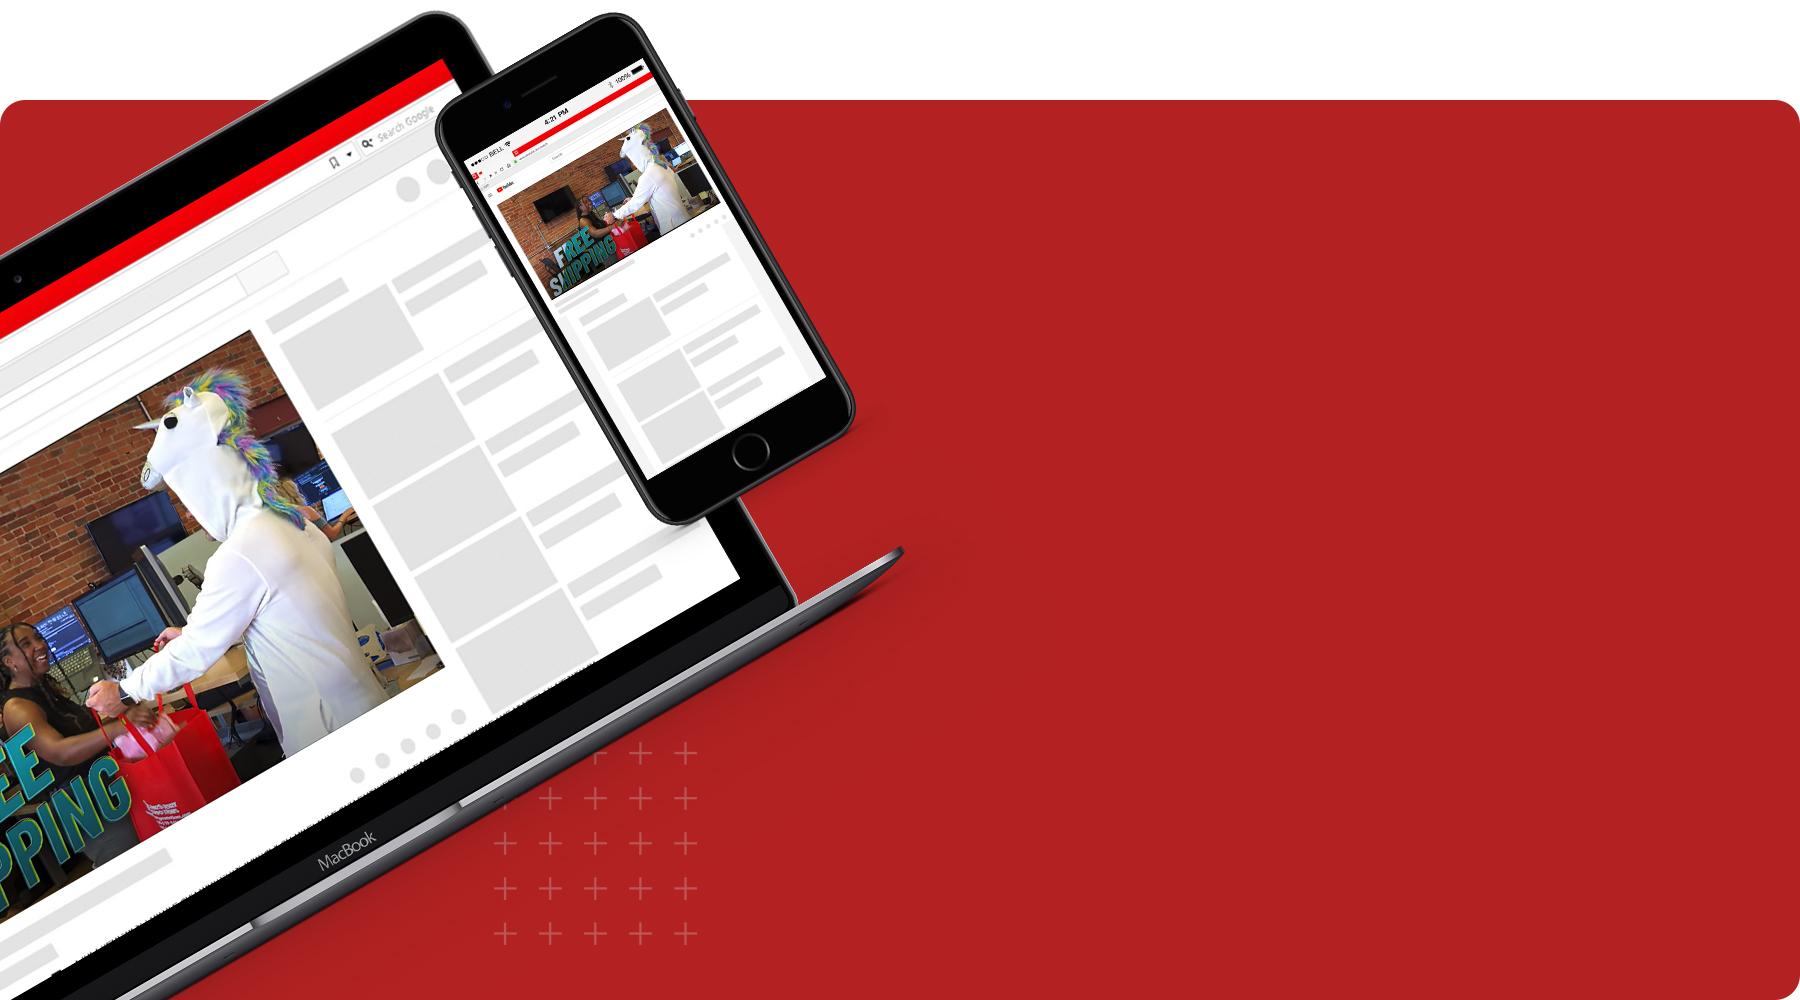 Casestudies-Youtube-Large-Laptop.jpg